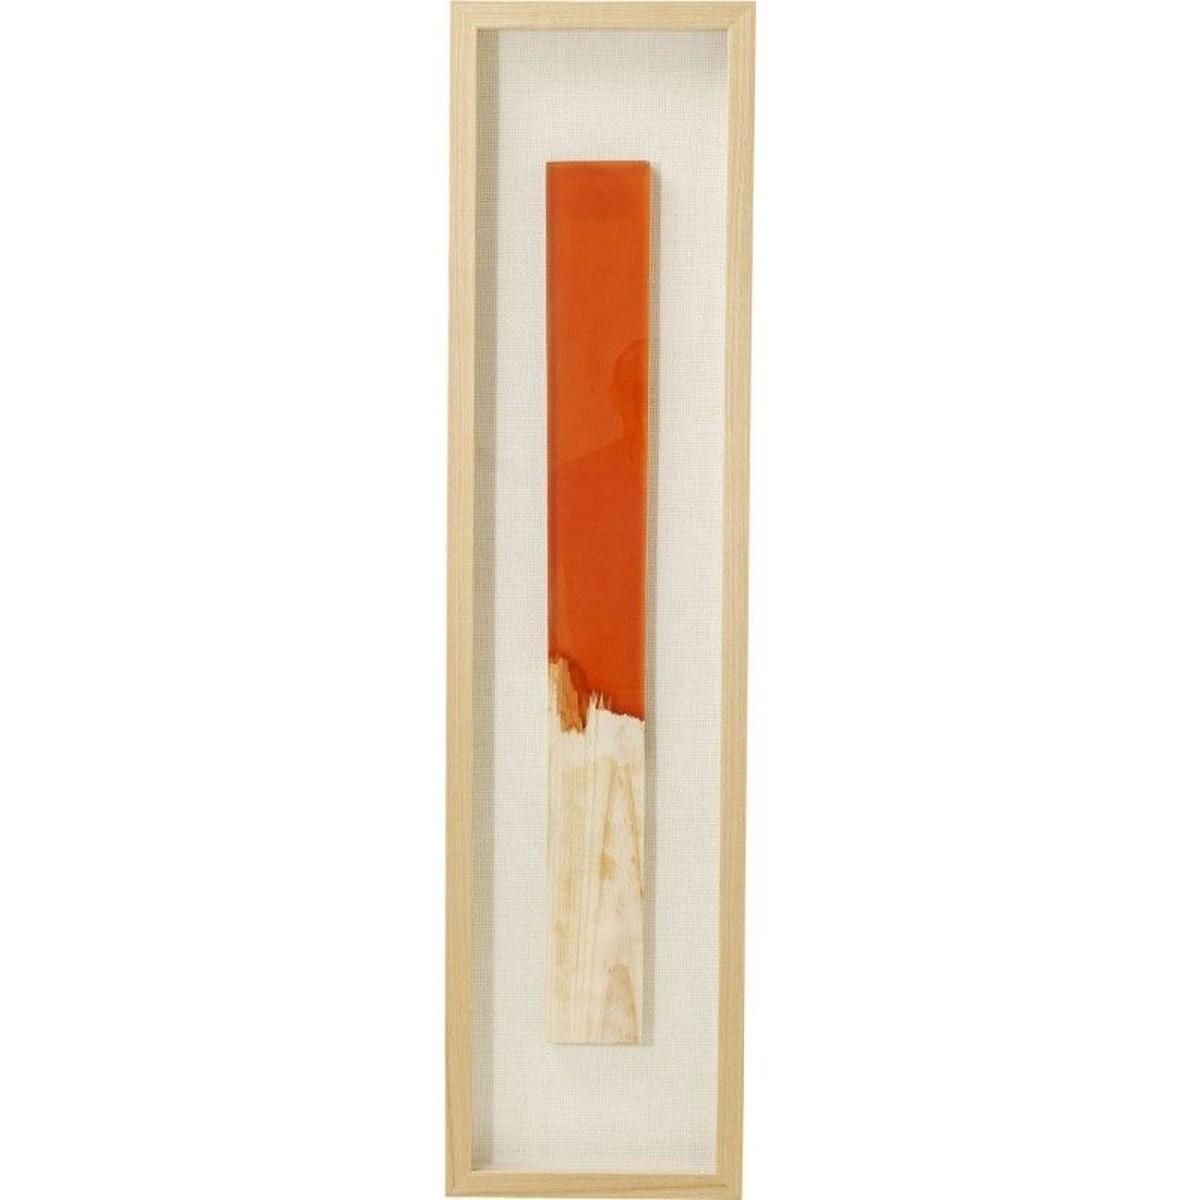 Tableau Match allumette orange 120x30cm Kare Design